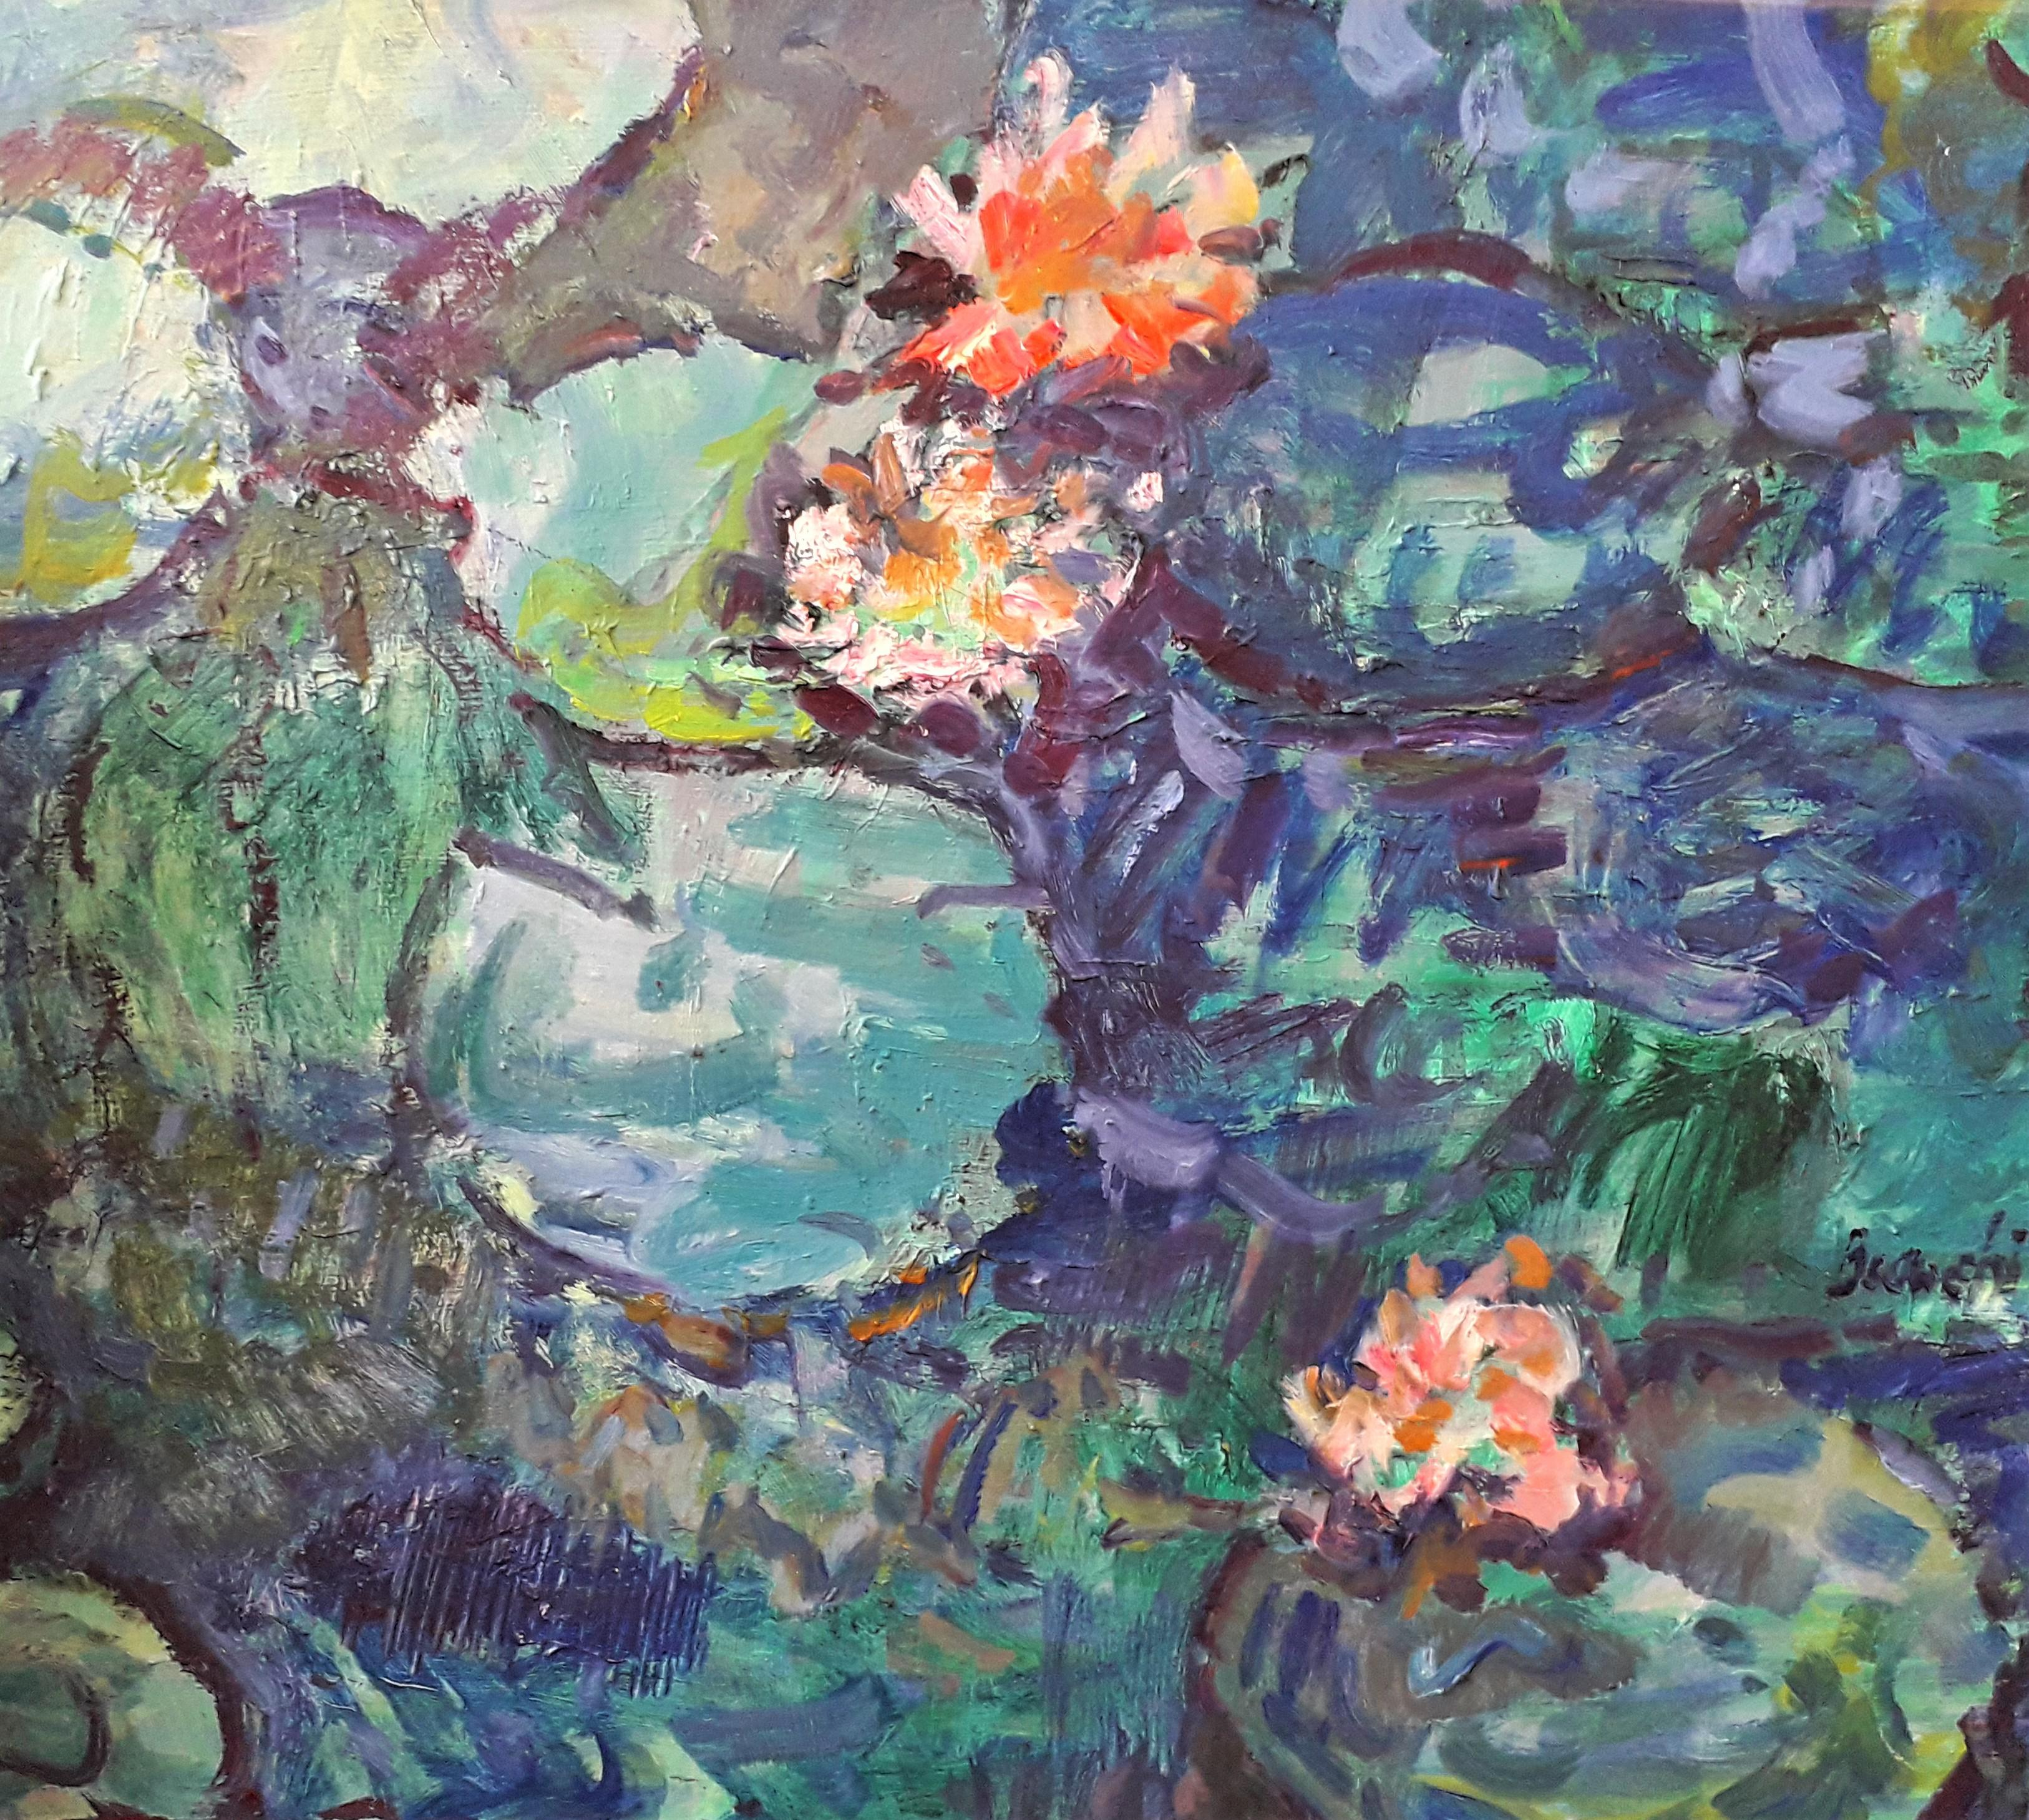 Frans Bianchi Waterlelies3